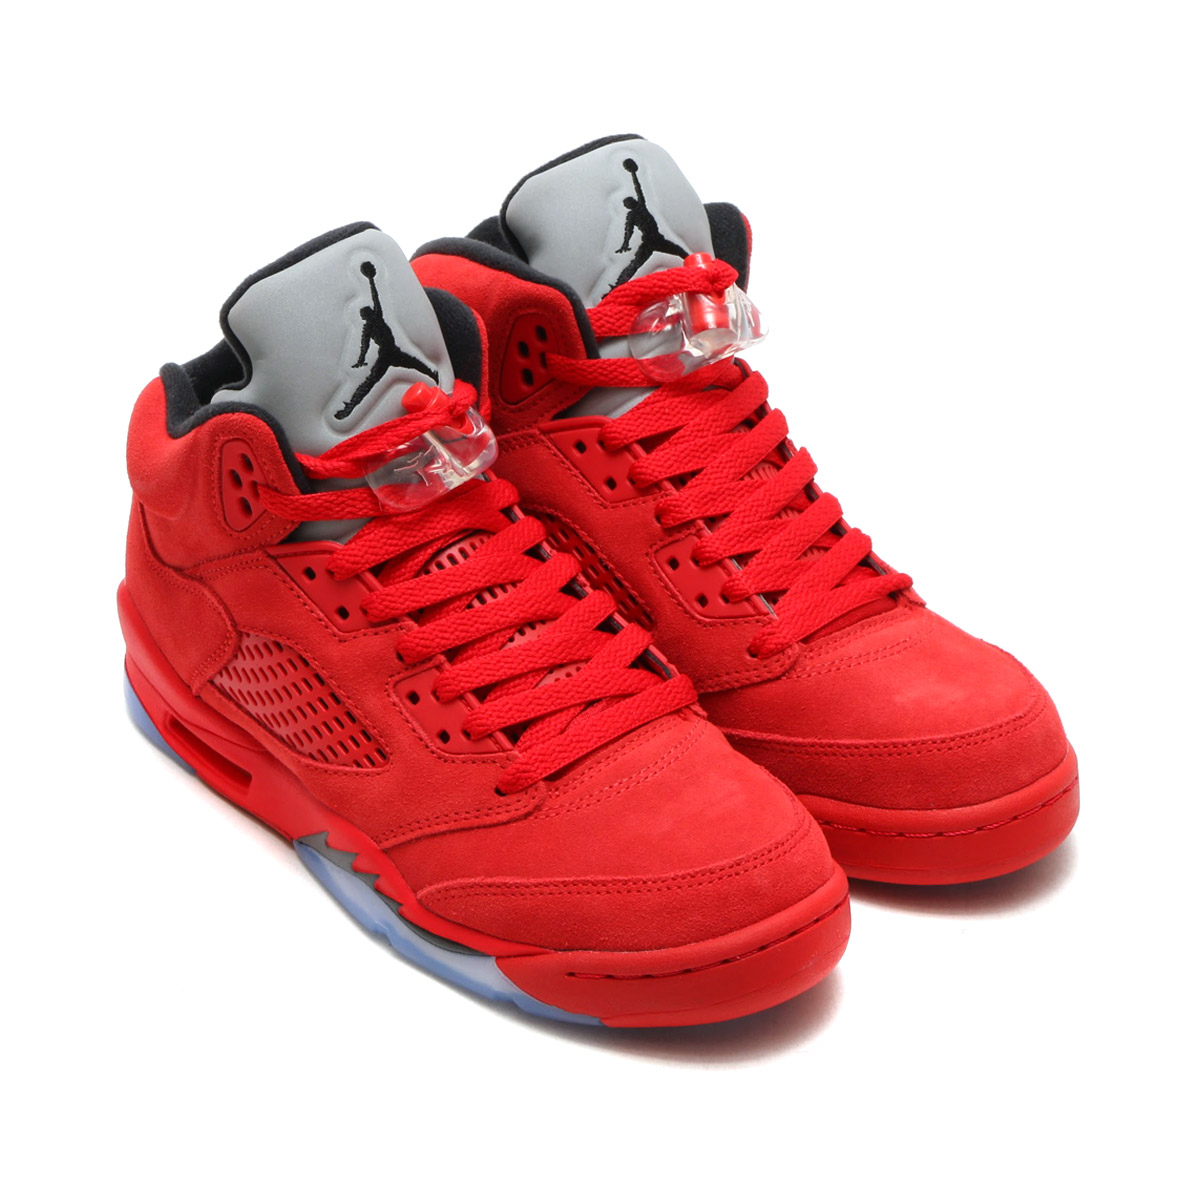 sale retailer 64631 c2d3f NIKE AIR JORDAN 5 RETRO BG (Nike Air Jordan 5 nostalgic BG) (UNIVERSITY RED  BLACK-UNIVERSITY RED) 17FA-S